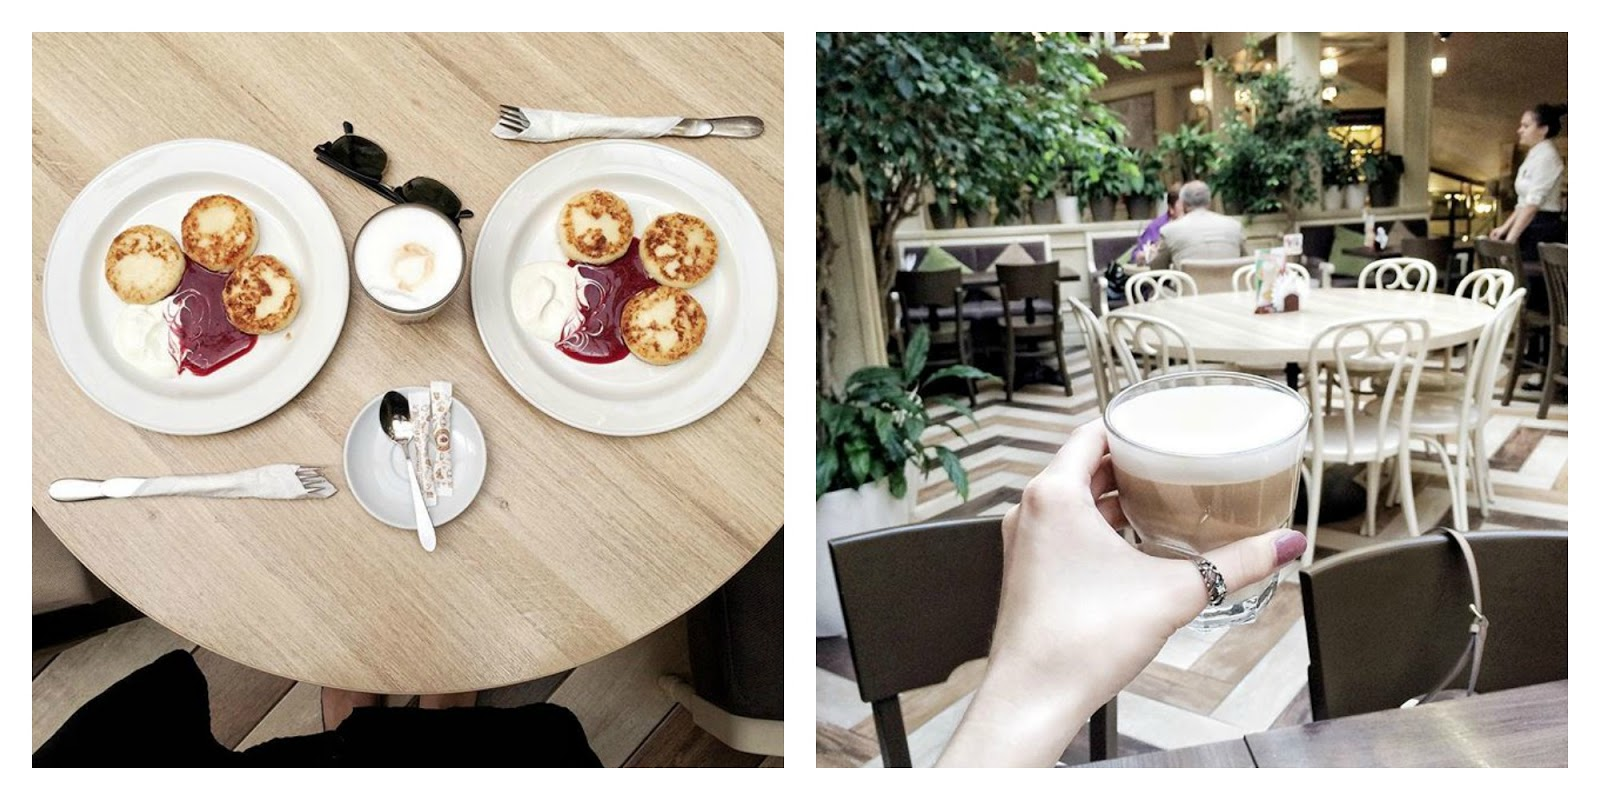 Shokoladnitsa Cafe | Moscow